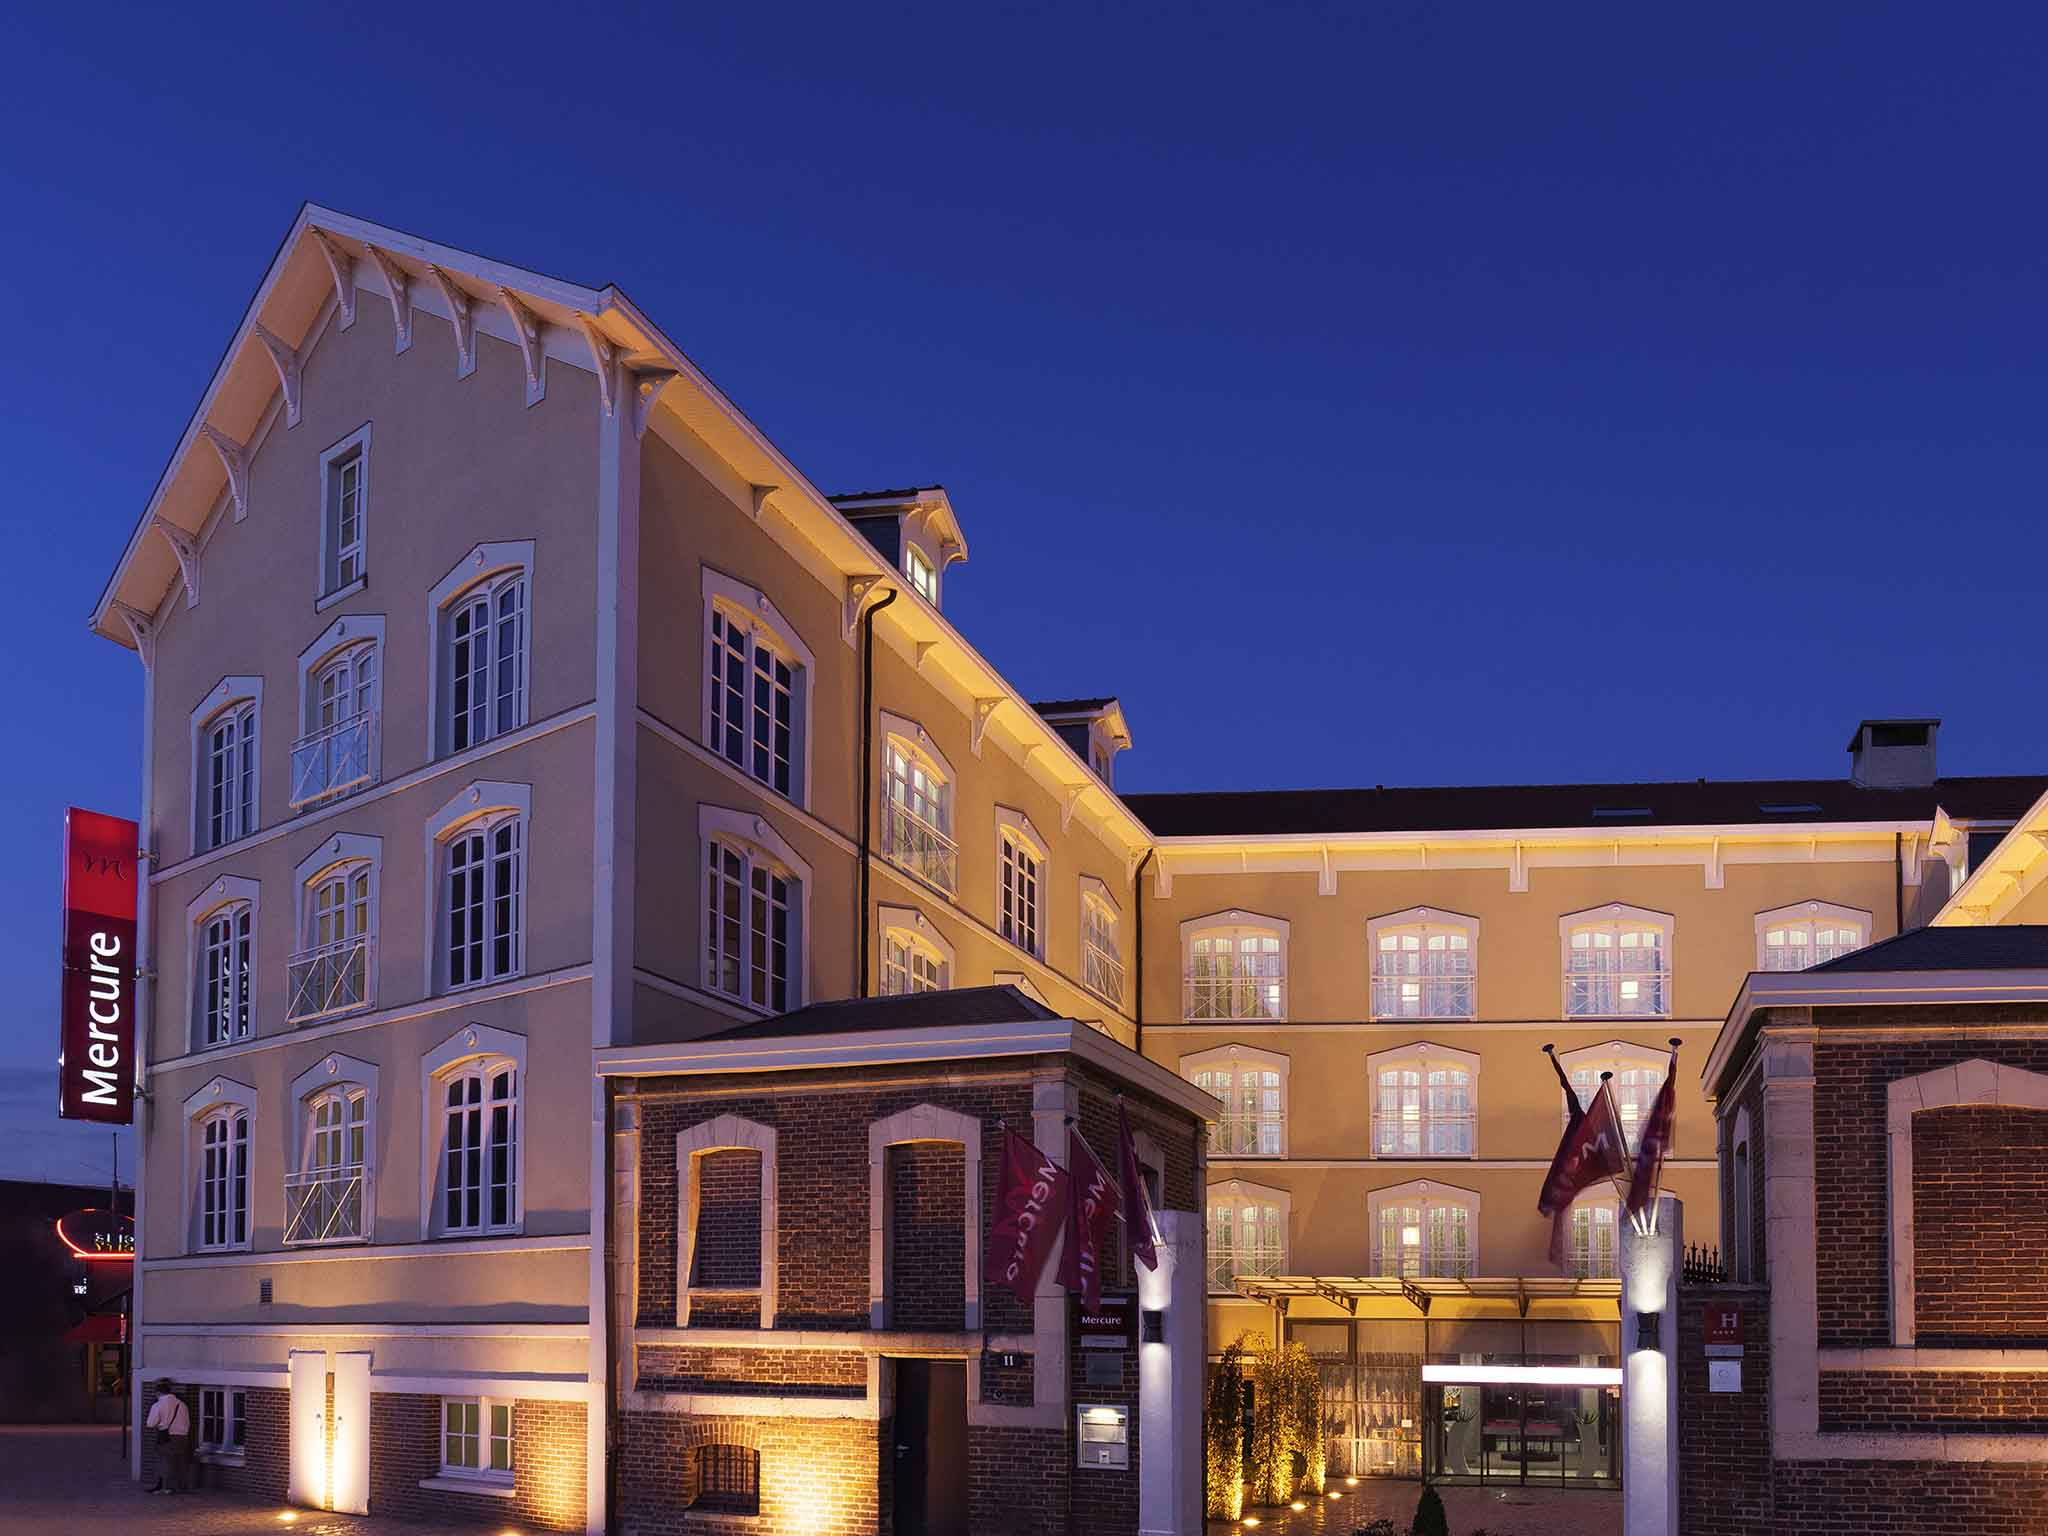 Hotel – Albergo Mercure Troyes Centre